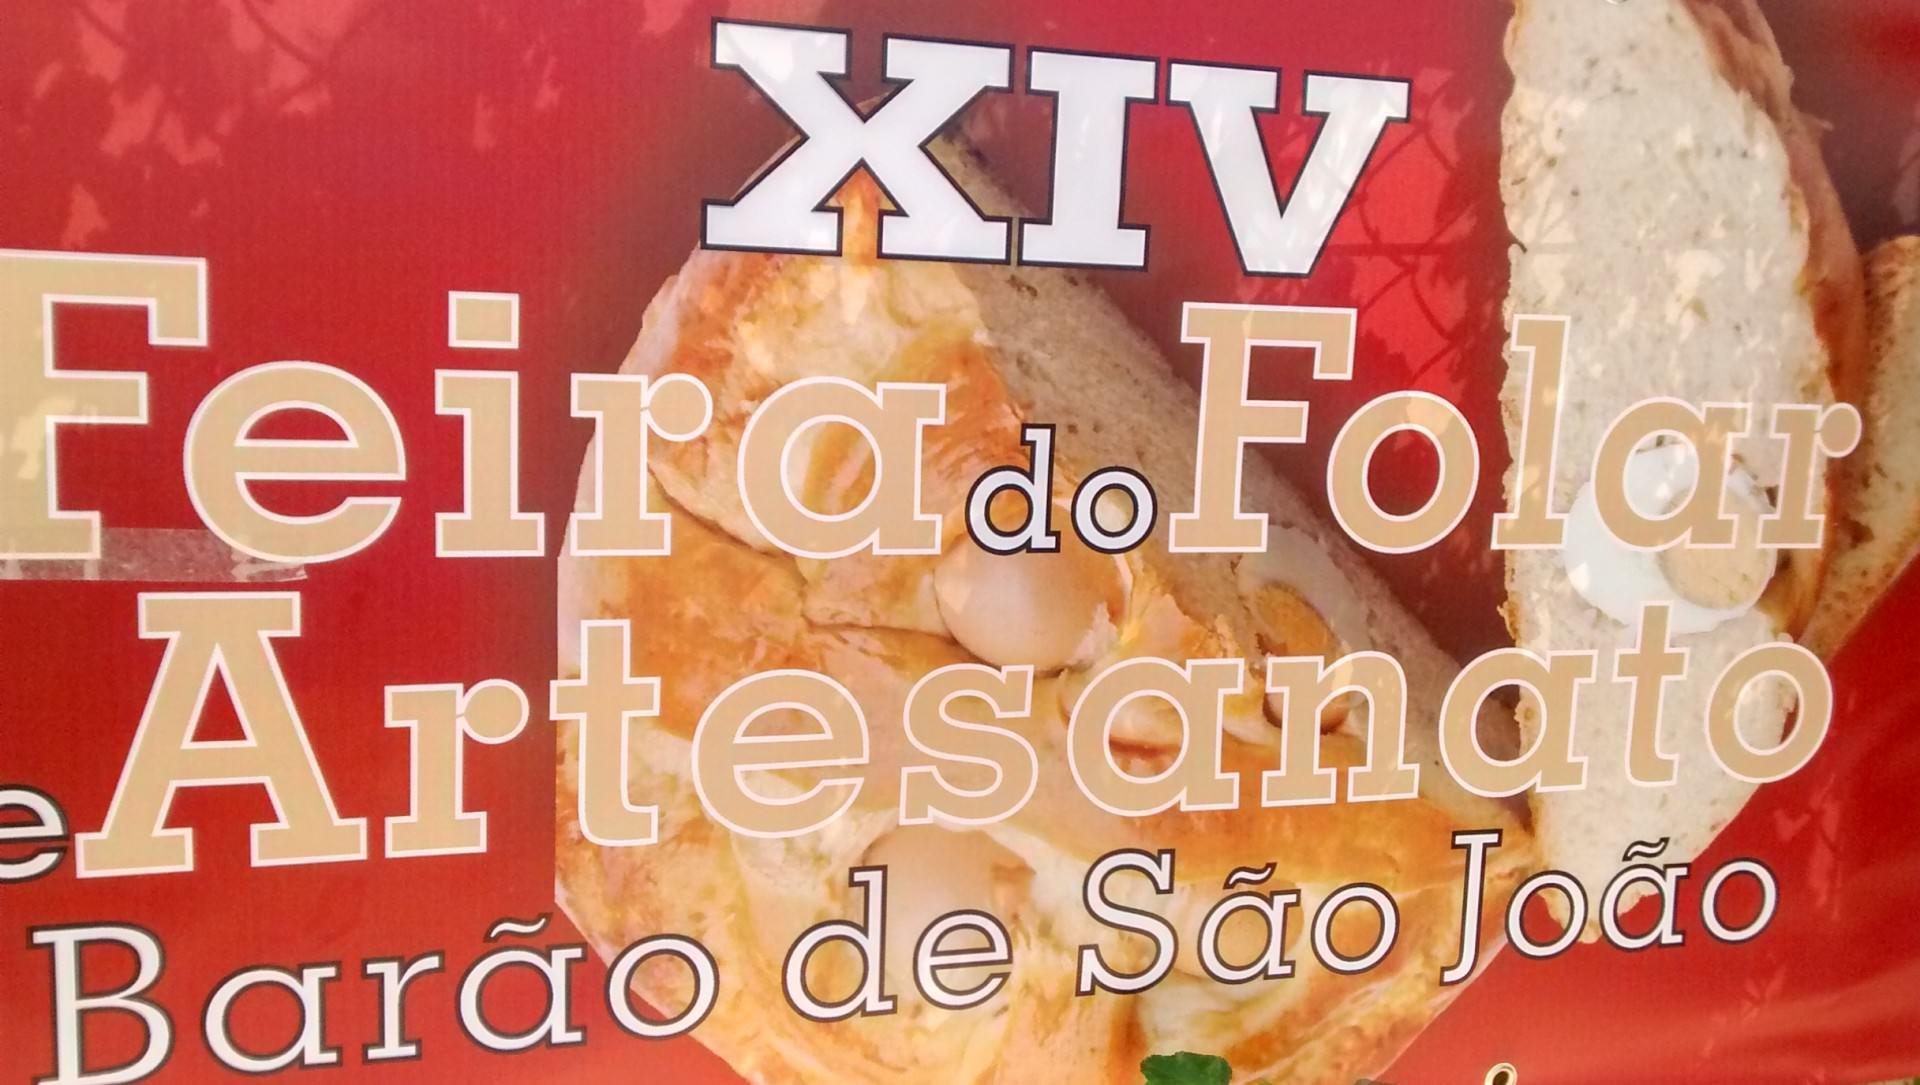 Feira-XIV-Pascoa-Barao-Sao-Joao